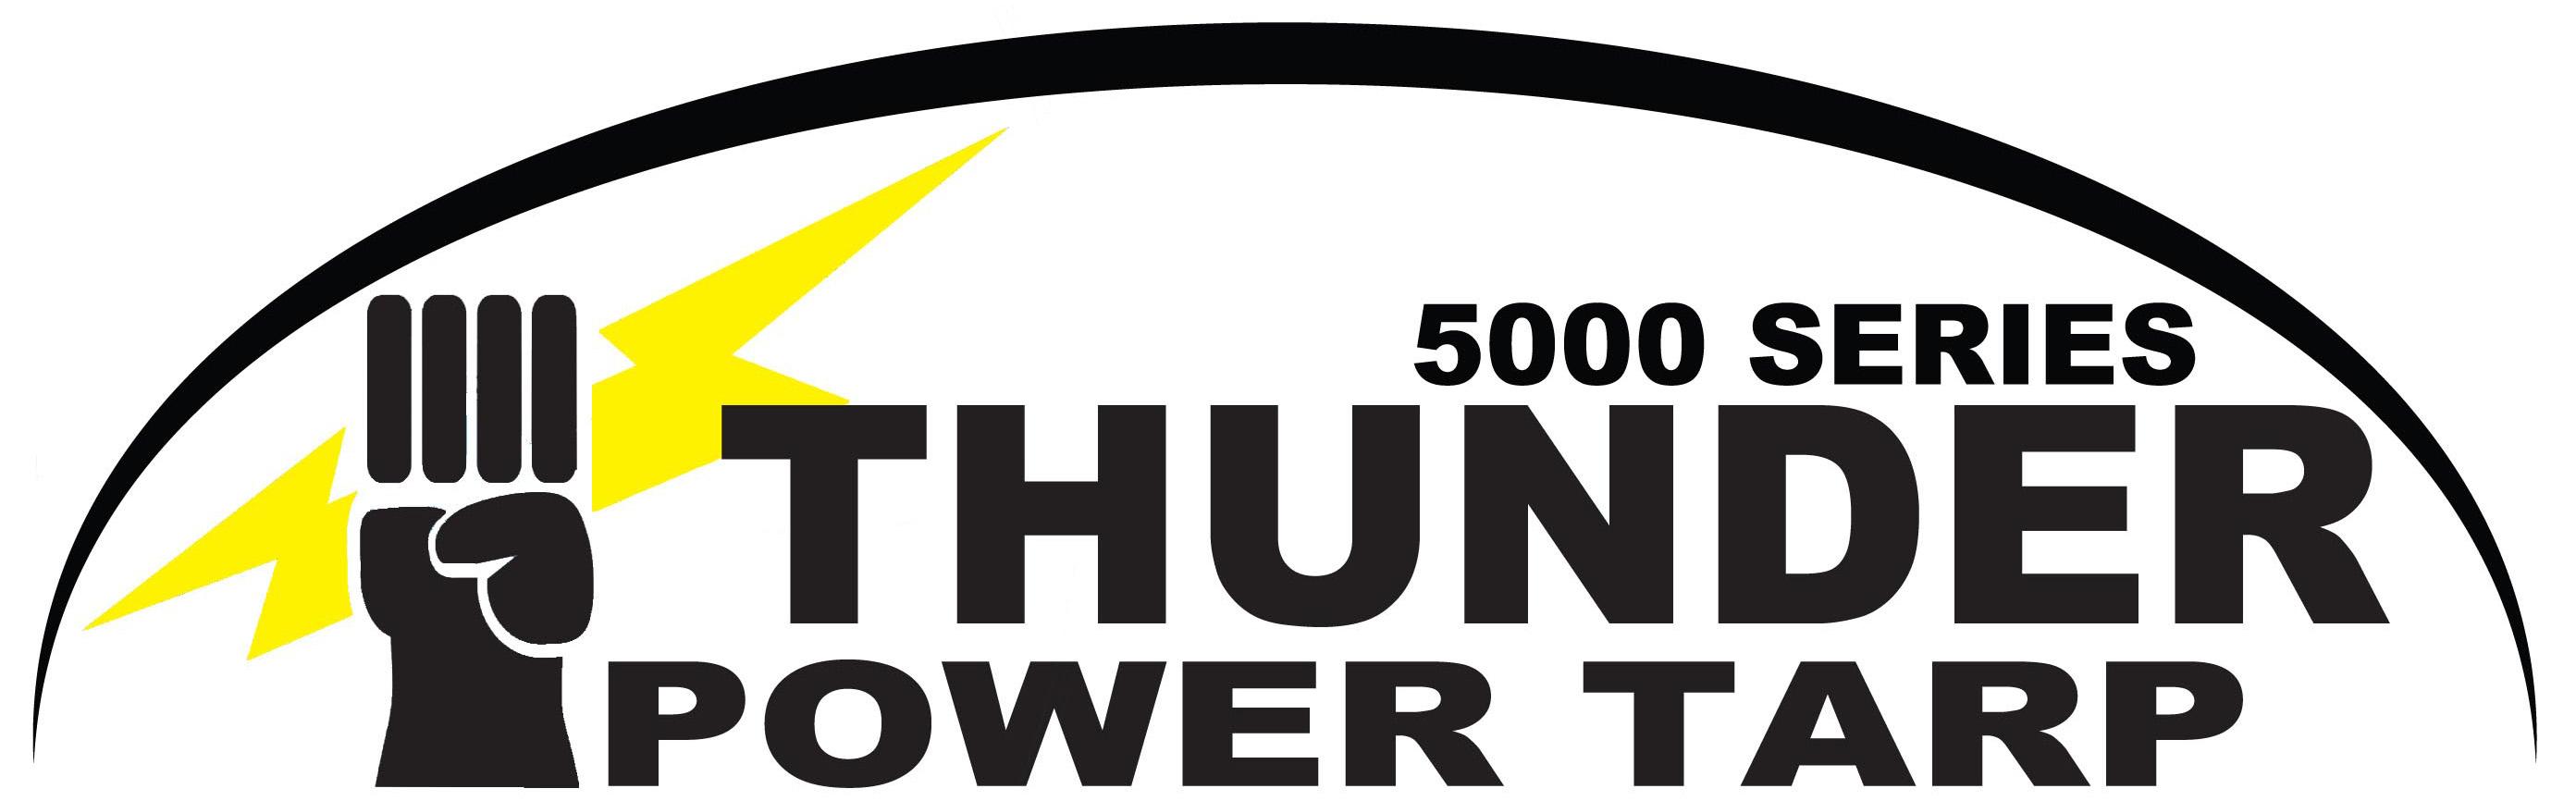 Thunder Power Tarp 5000 Series Logo